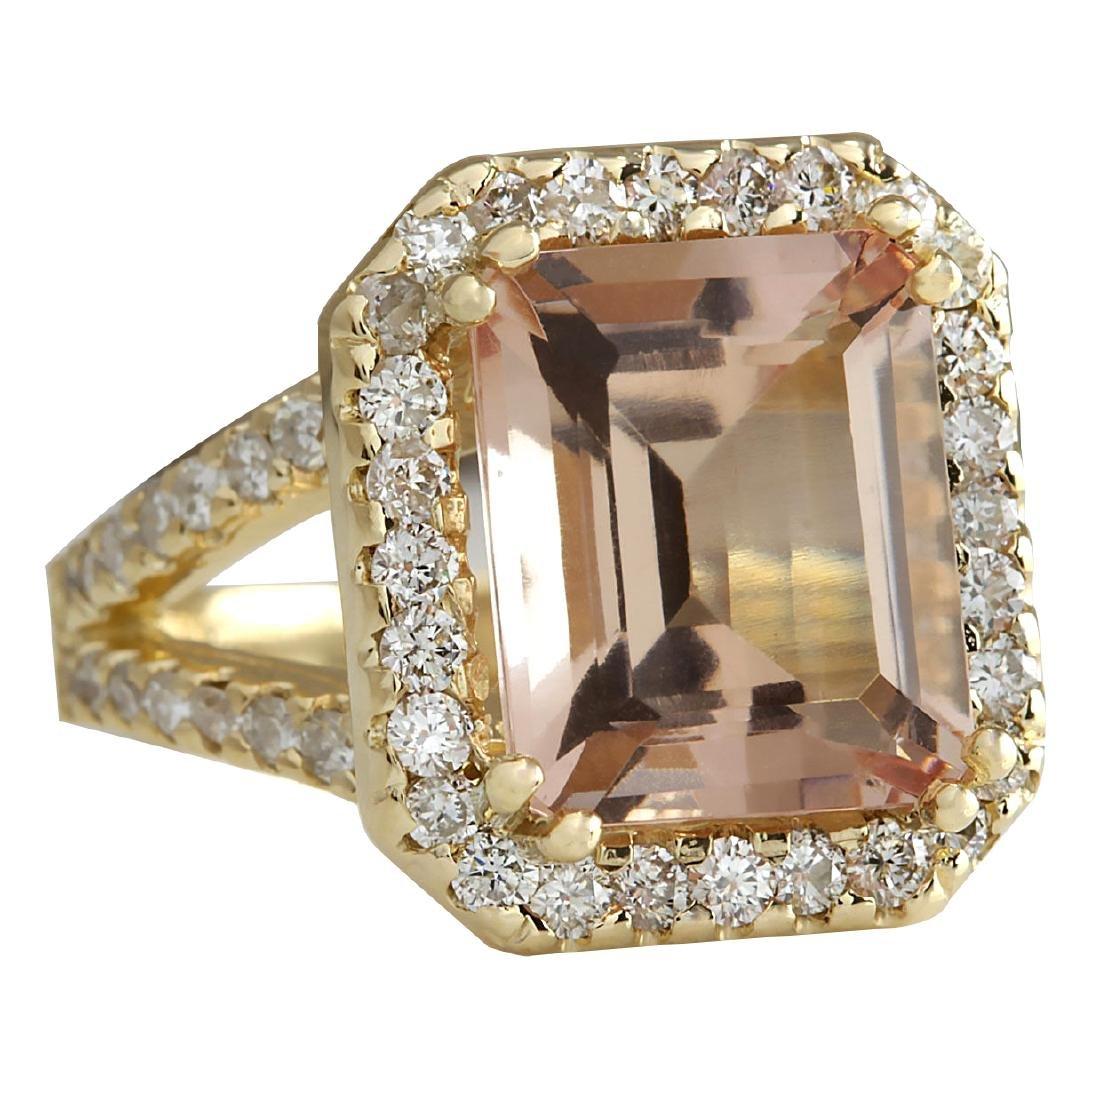 6.92CTW Natural Peach Morganite And Diamond Ring In 18K - 2